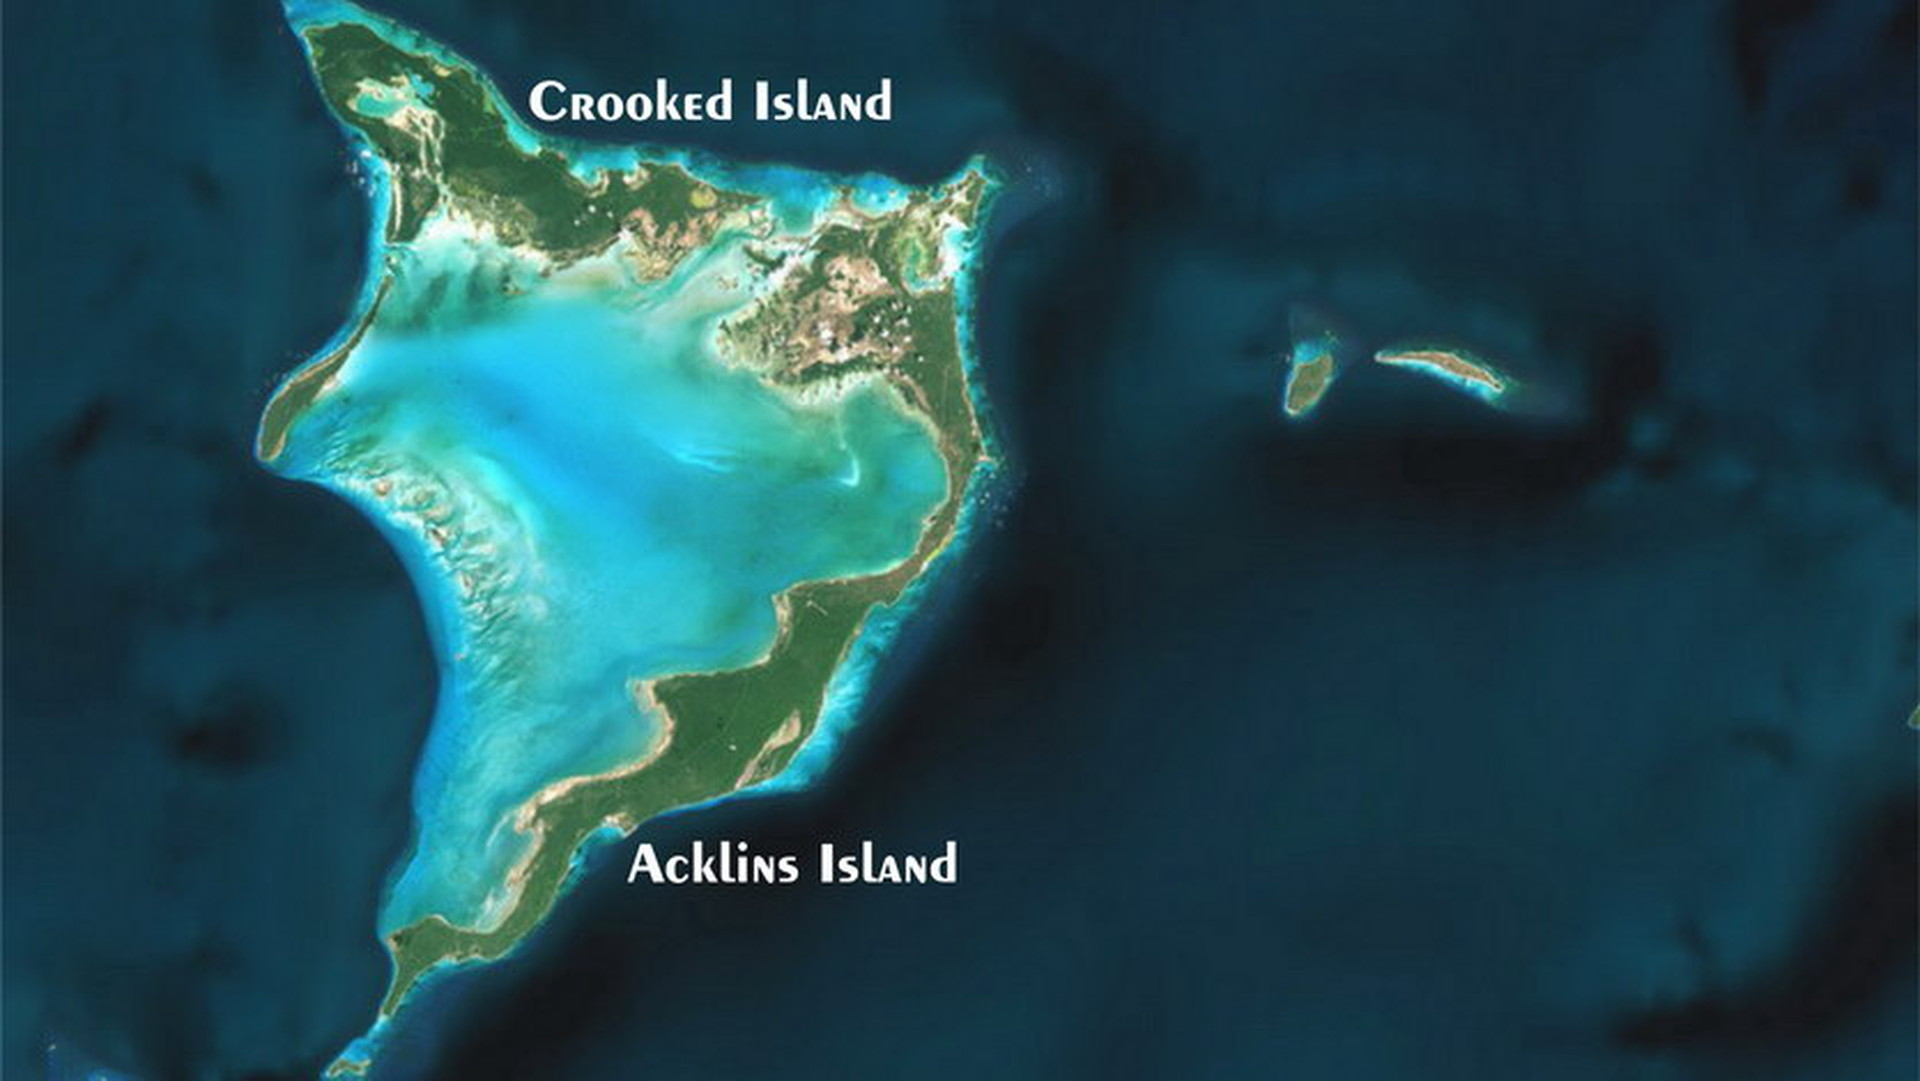 Crooked & Acklins Islands, Bahamas